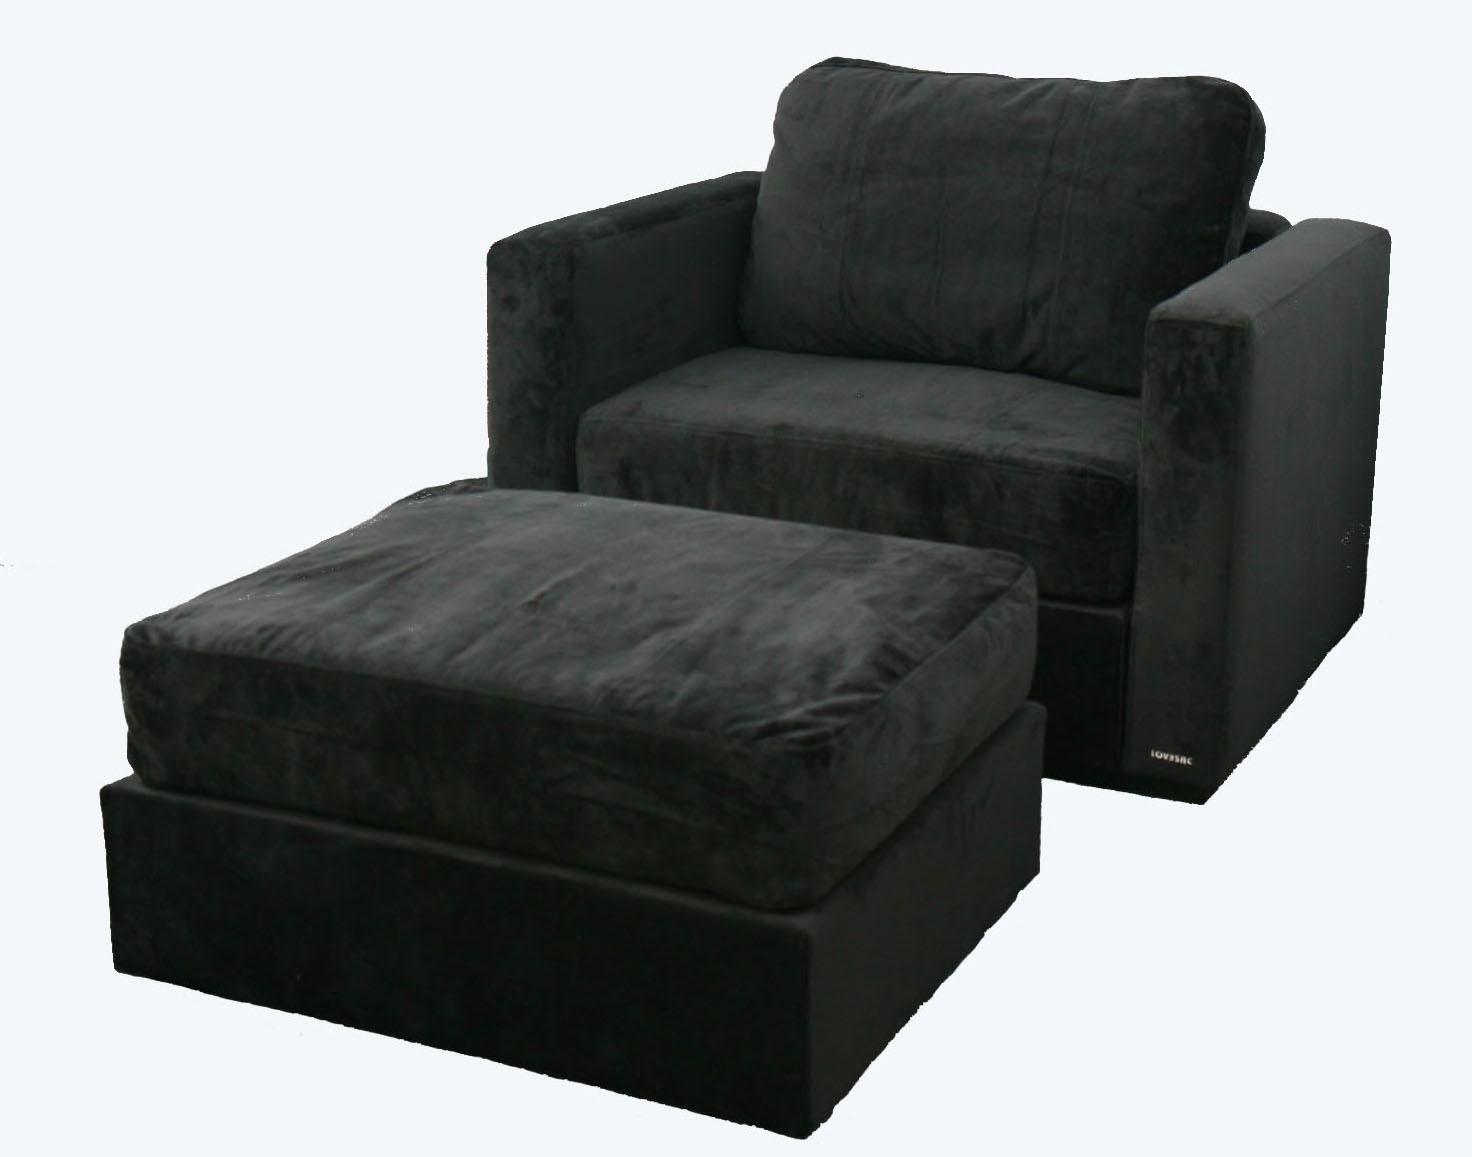 Lovesac Black Armchair with Ottoman